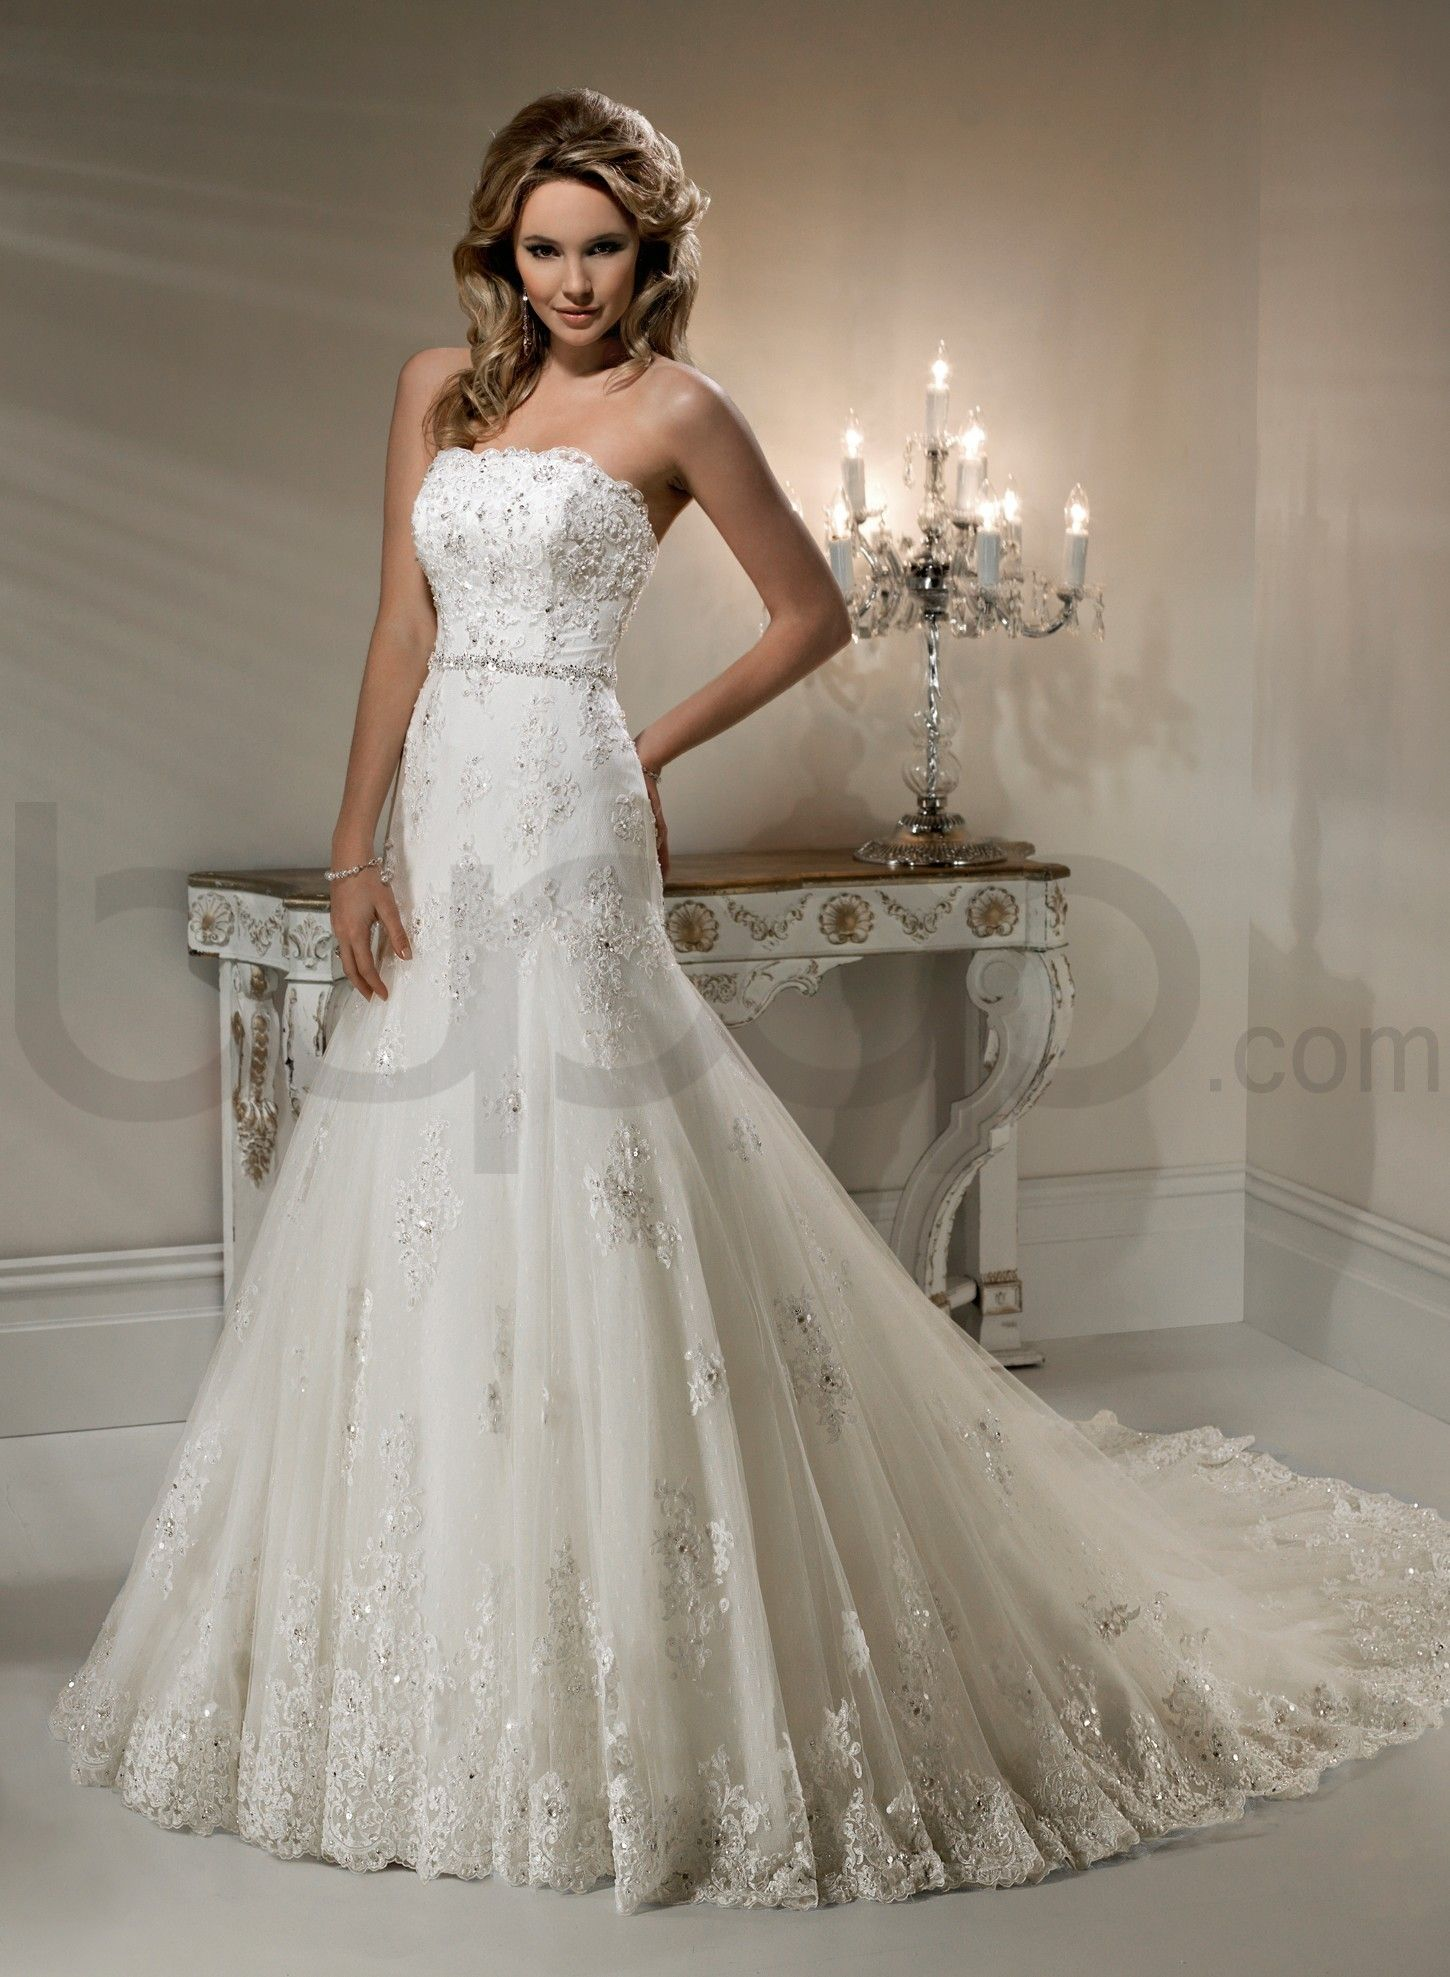 Charmant Lace Wedding Dresses | Lace Scalloped Neckline A Line Wedding Dress    Bupop.com